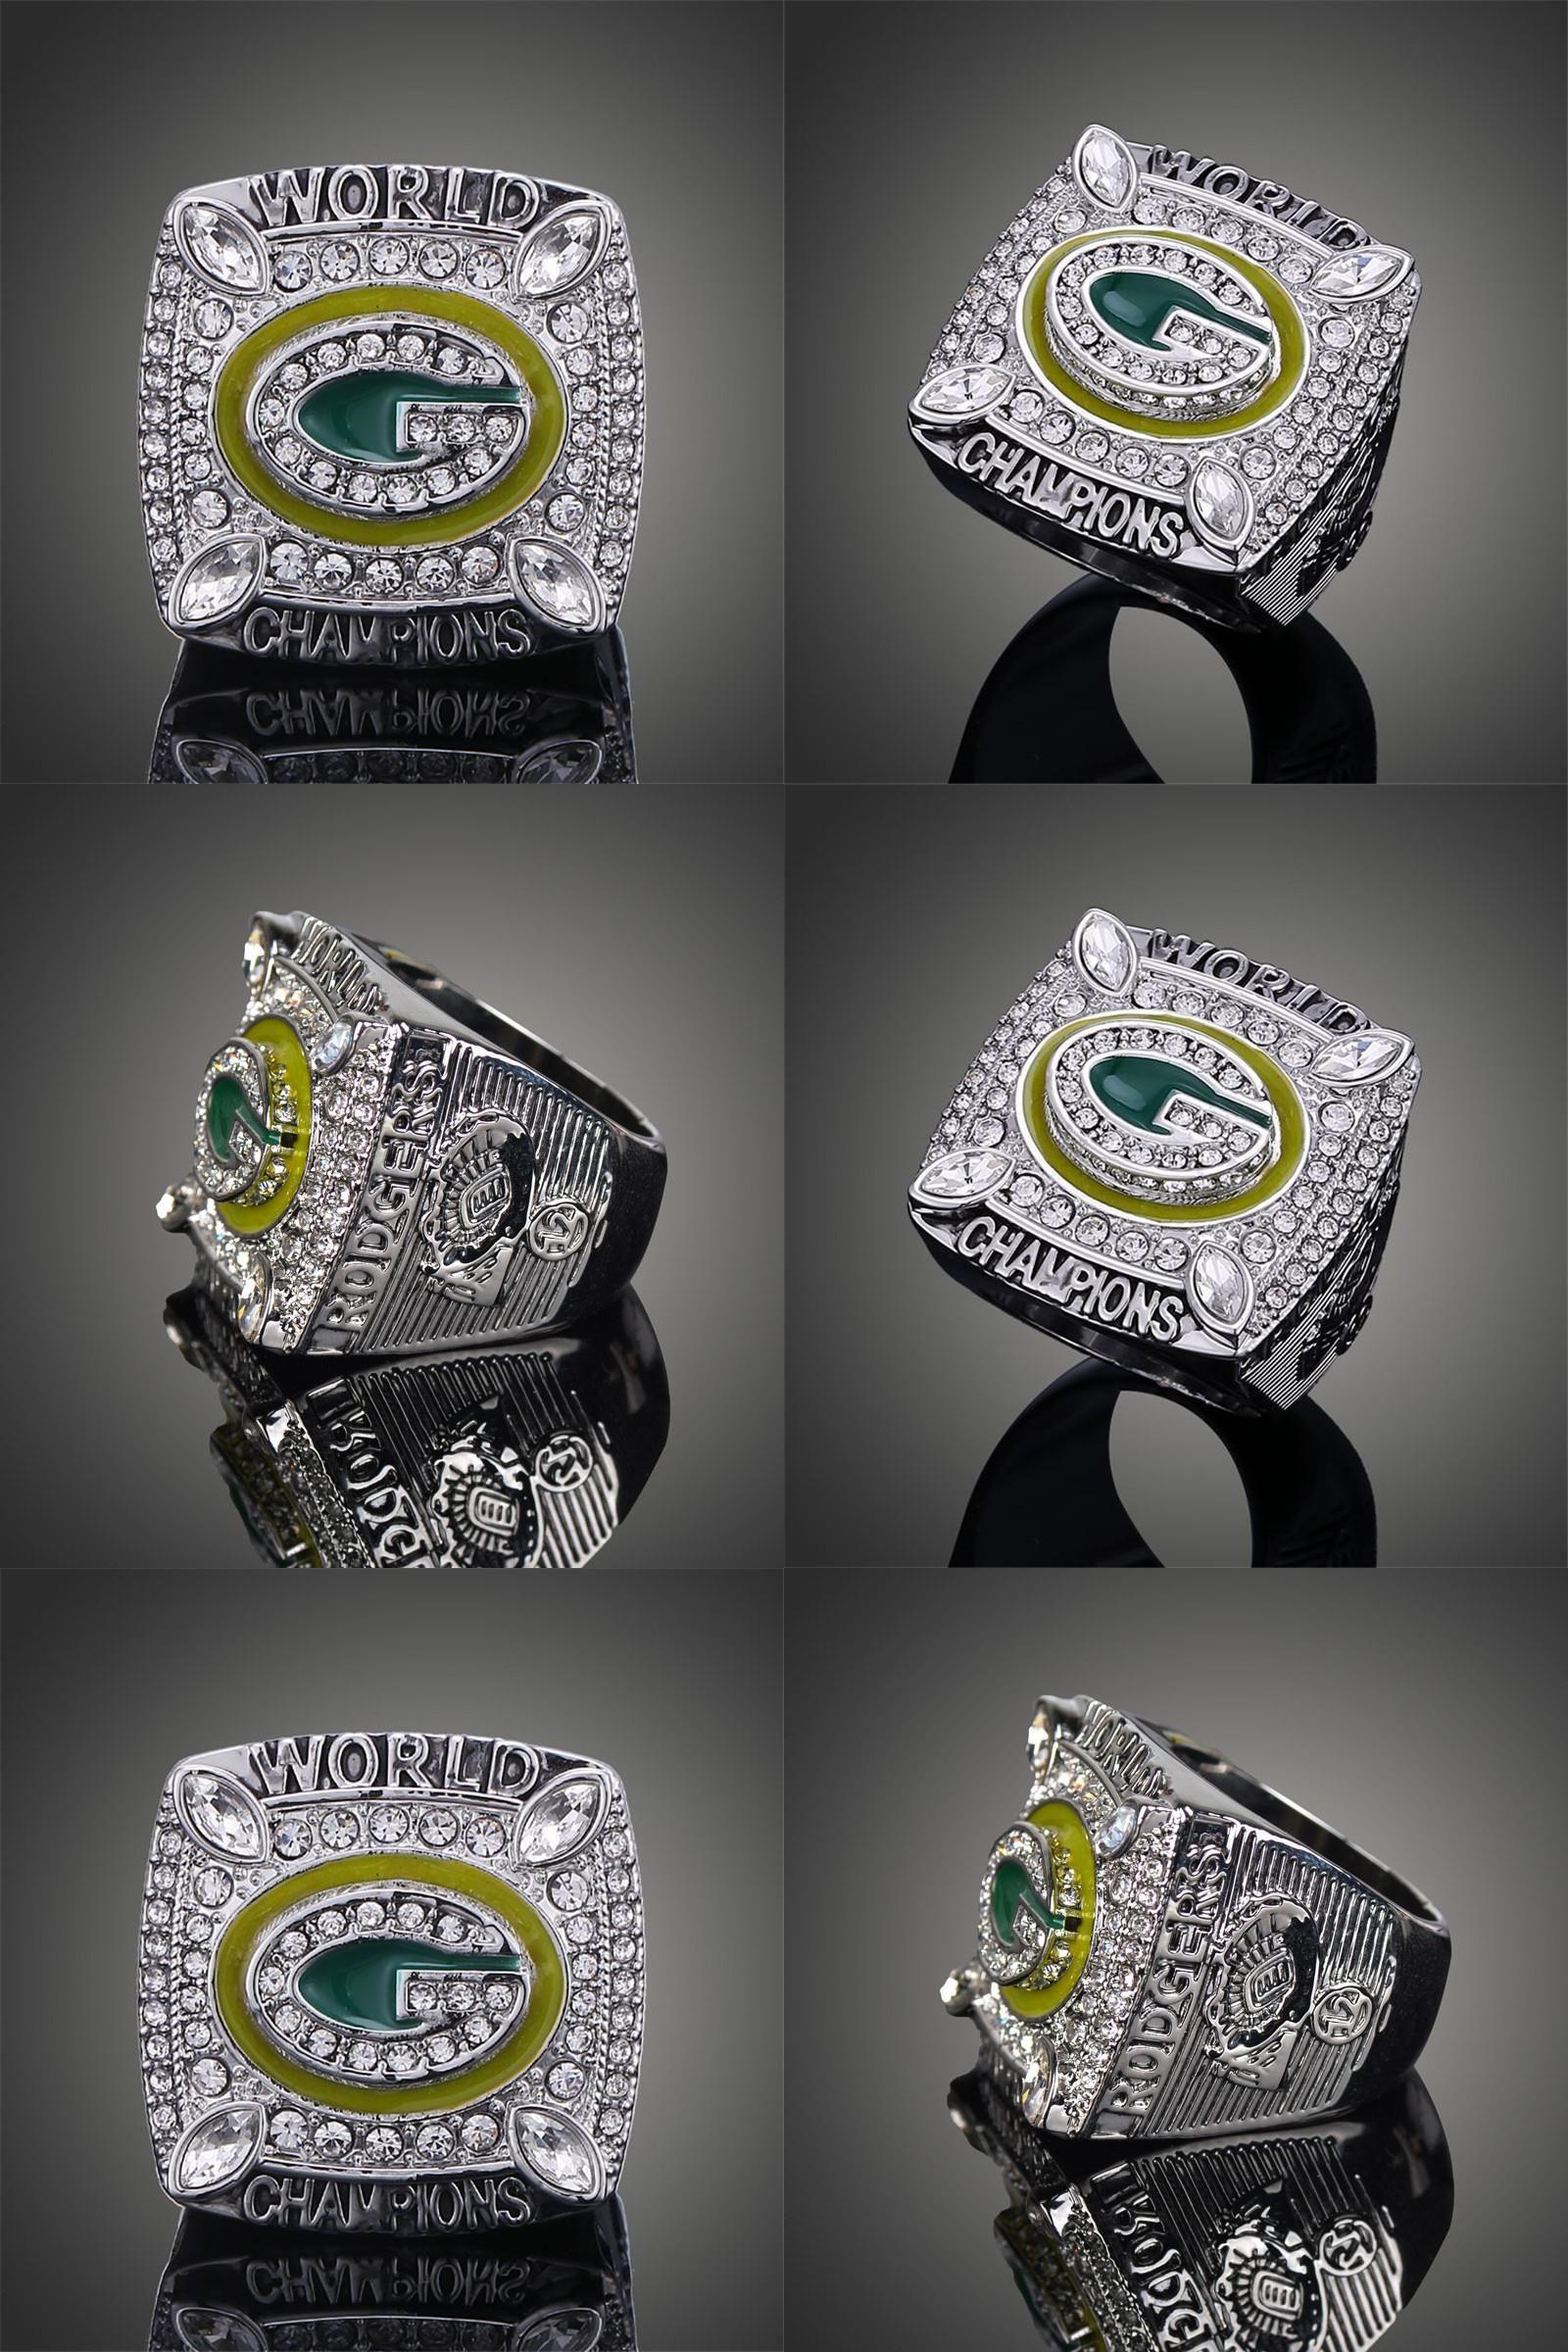 Visit To Buy Championship Rings Men Ring Replica Wisconsin Green Bay Packers Super Bowl Rings Elite Qb Aar Super Bowl Rings Rings For Men Wisconsin Green Bay